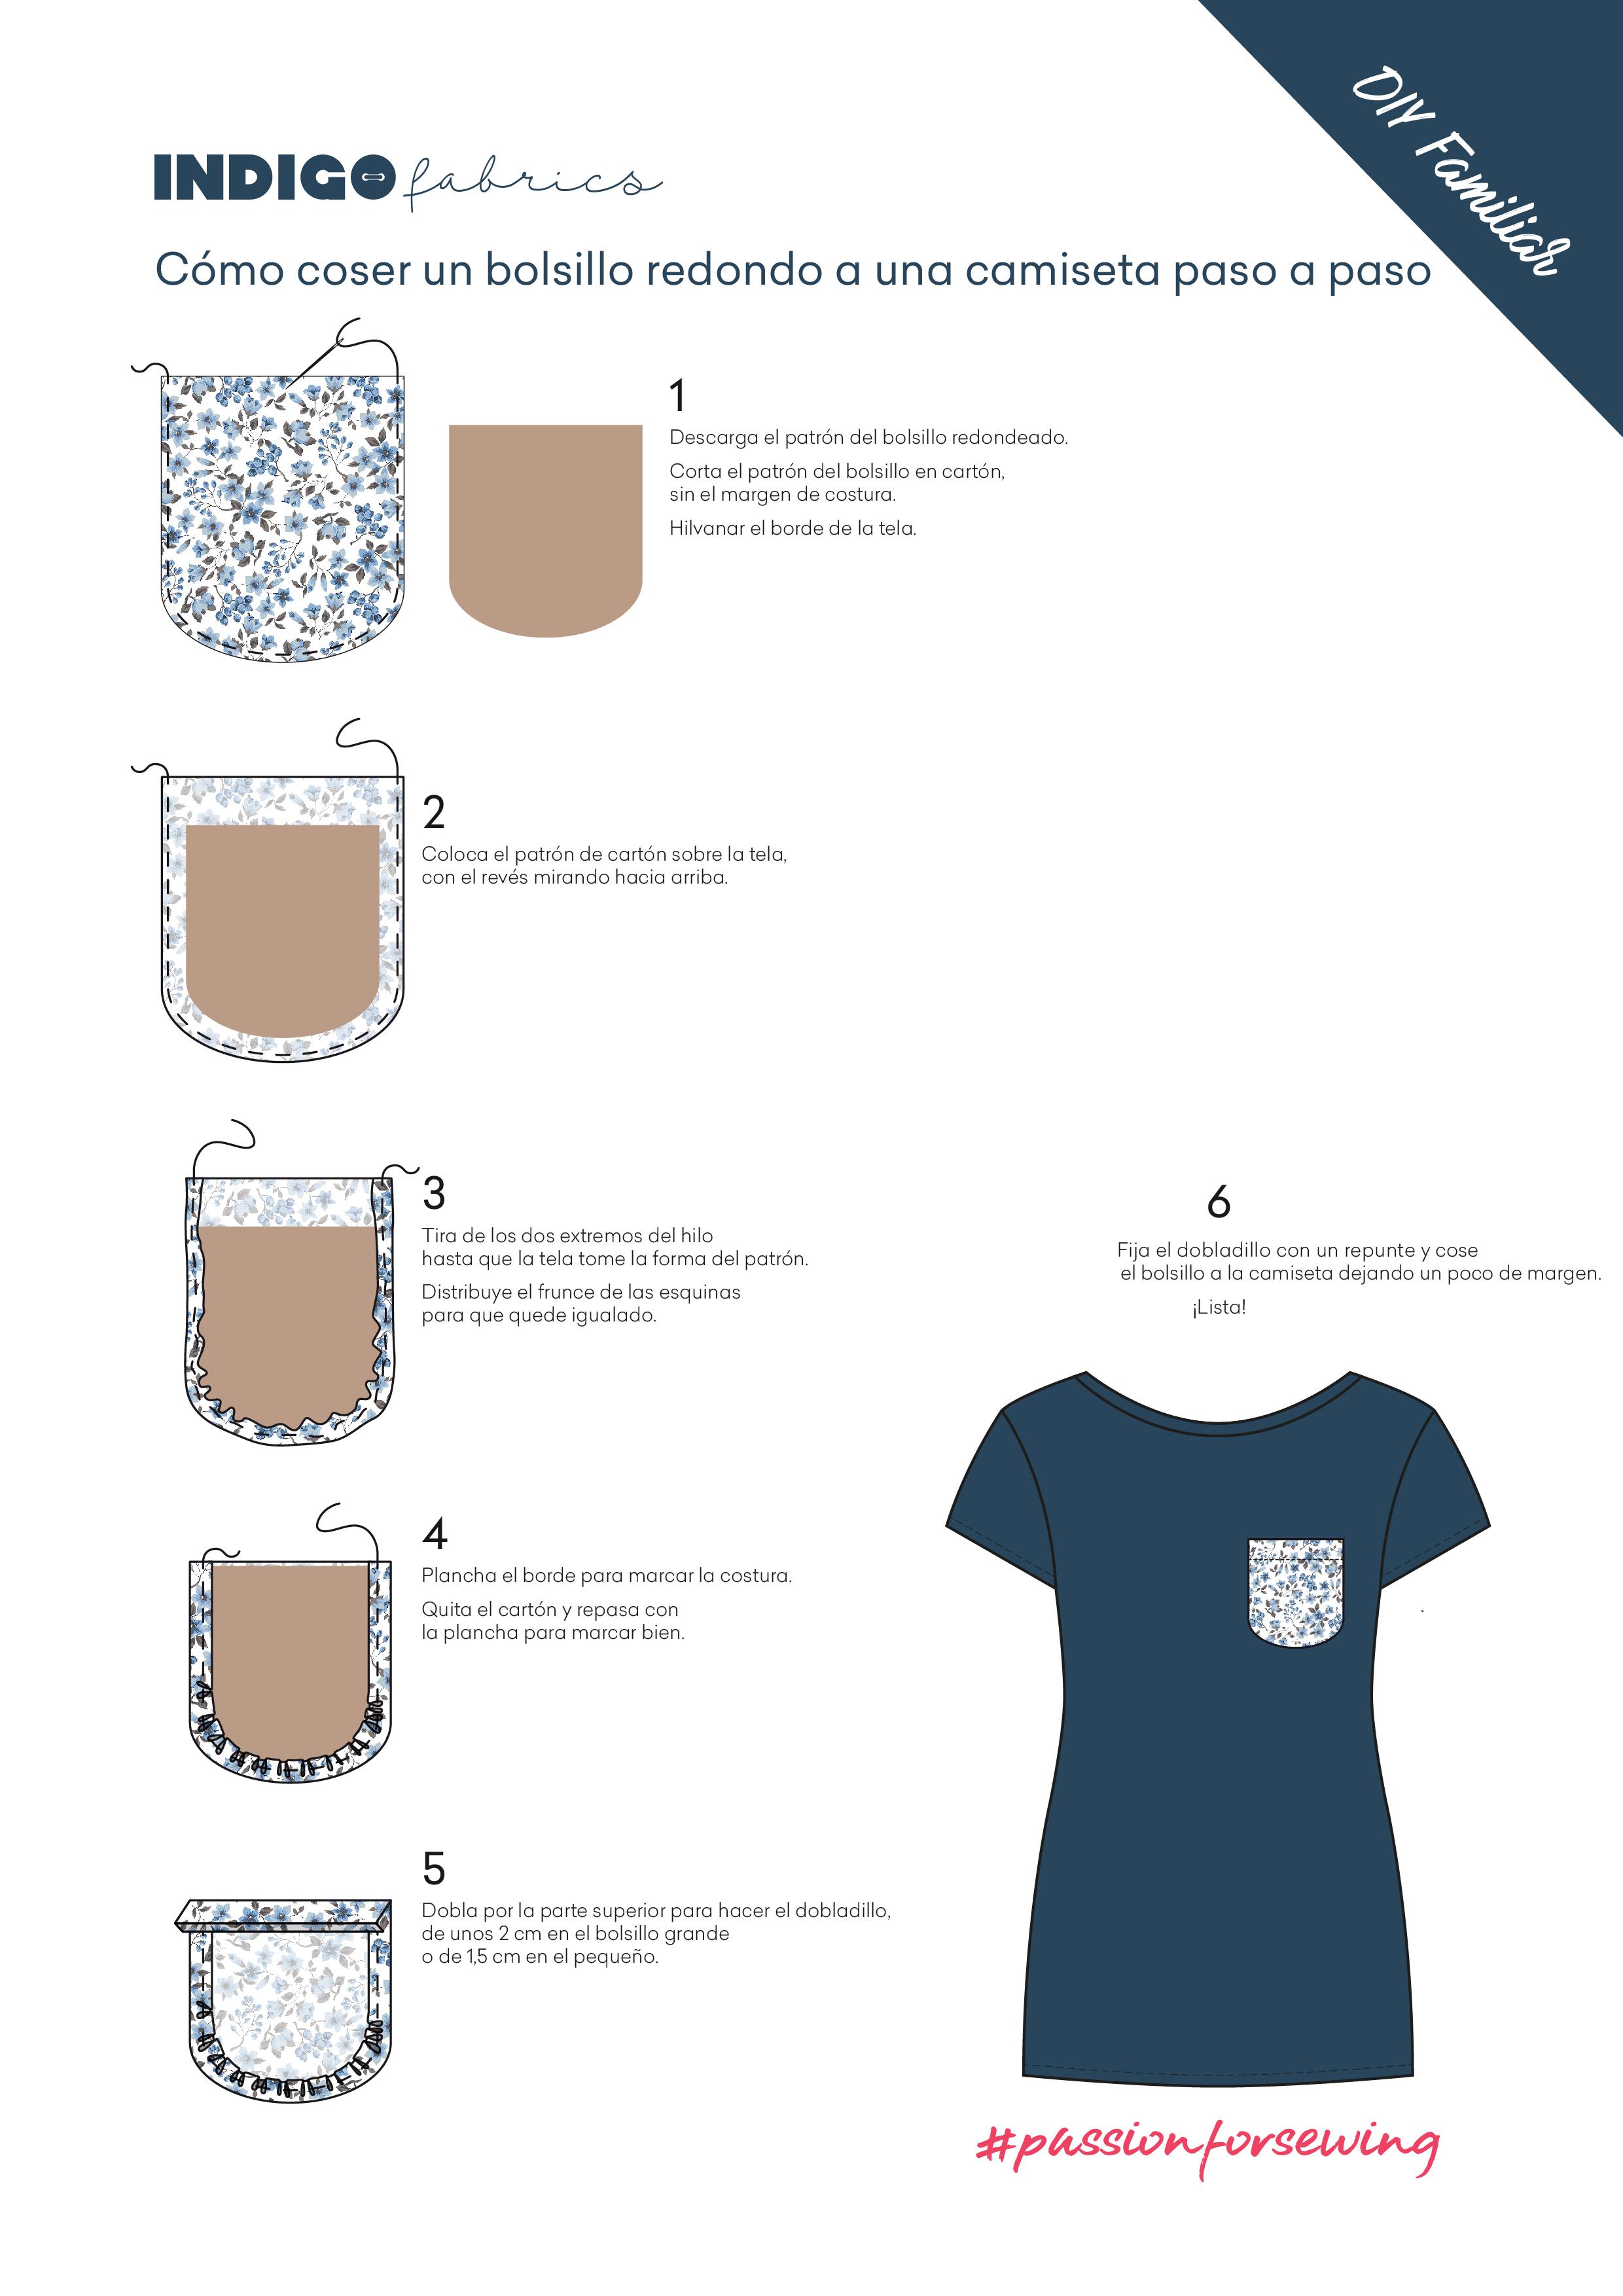 Cómo coser un bolsillo redondo a una camiseta paso a paso